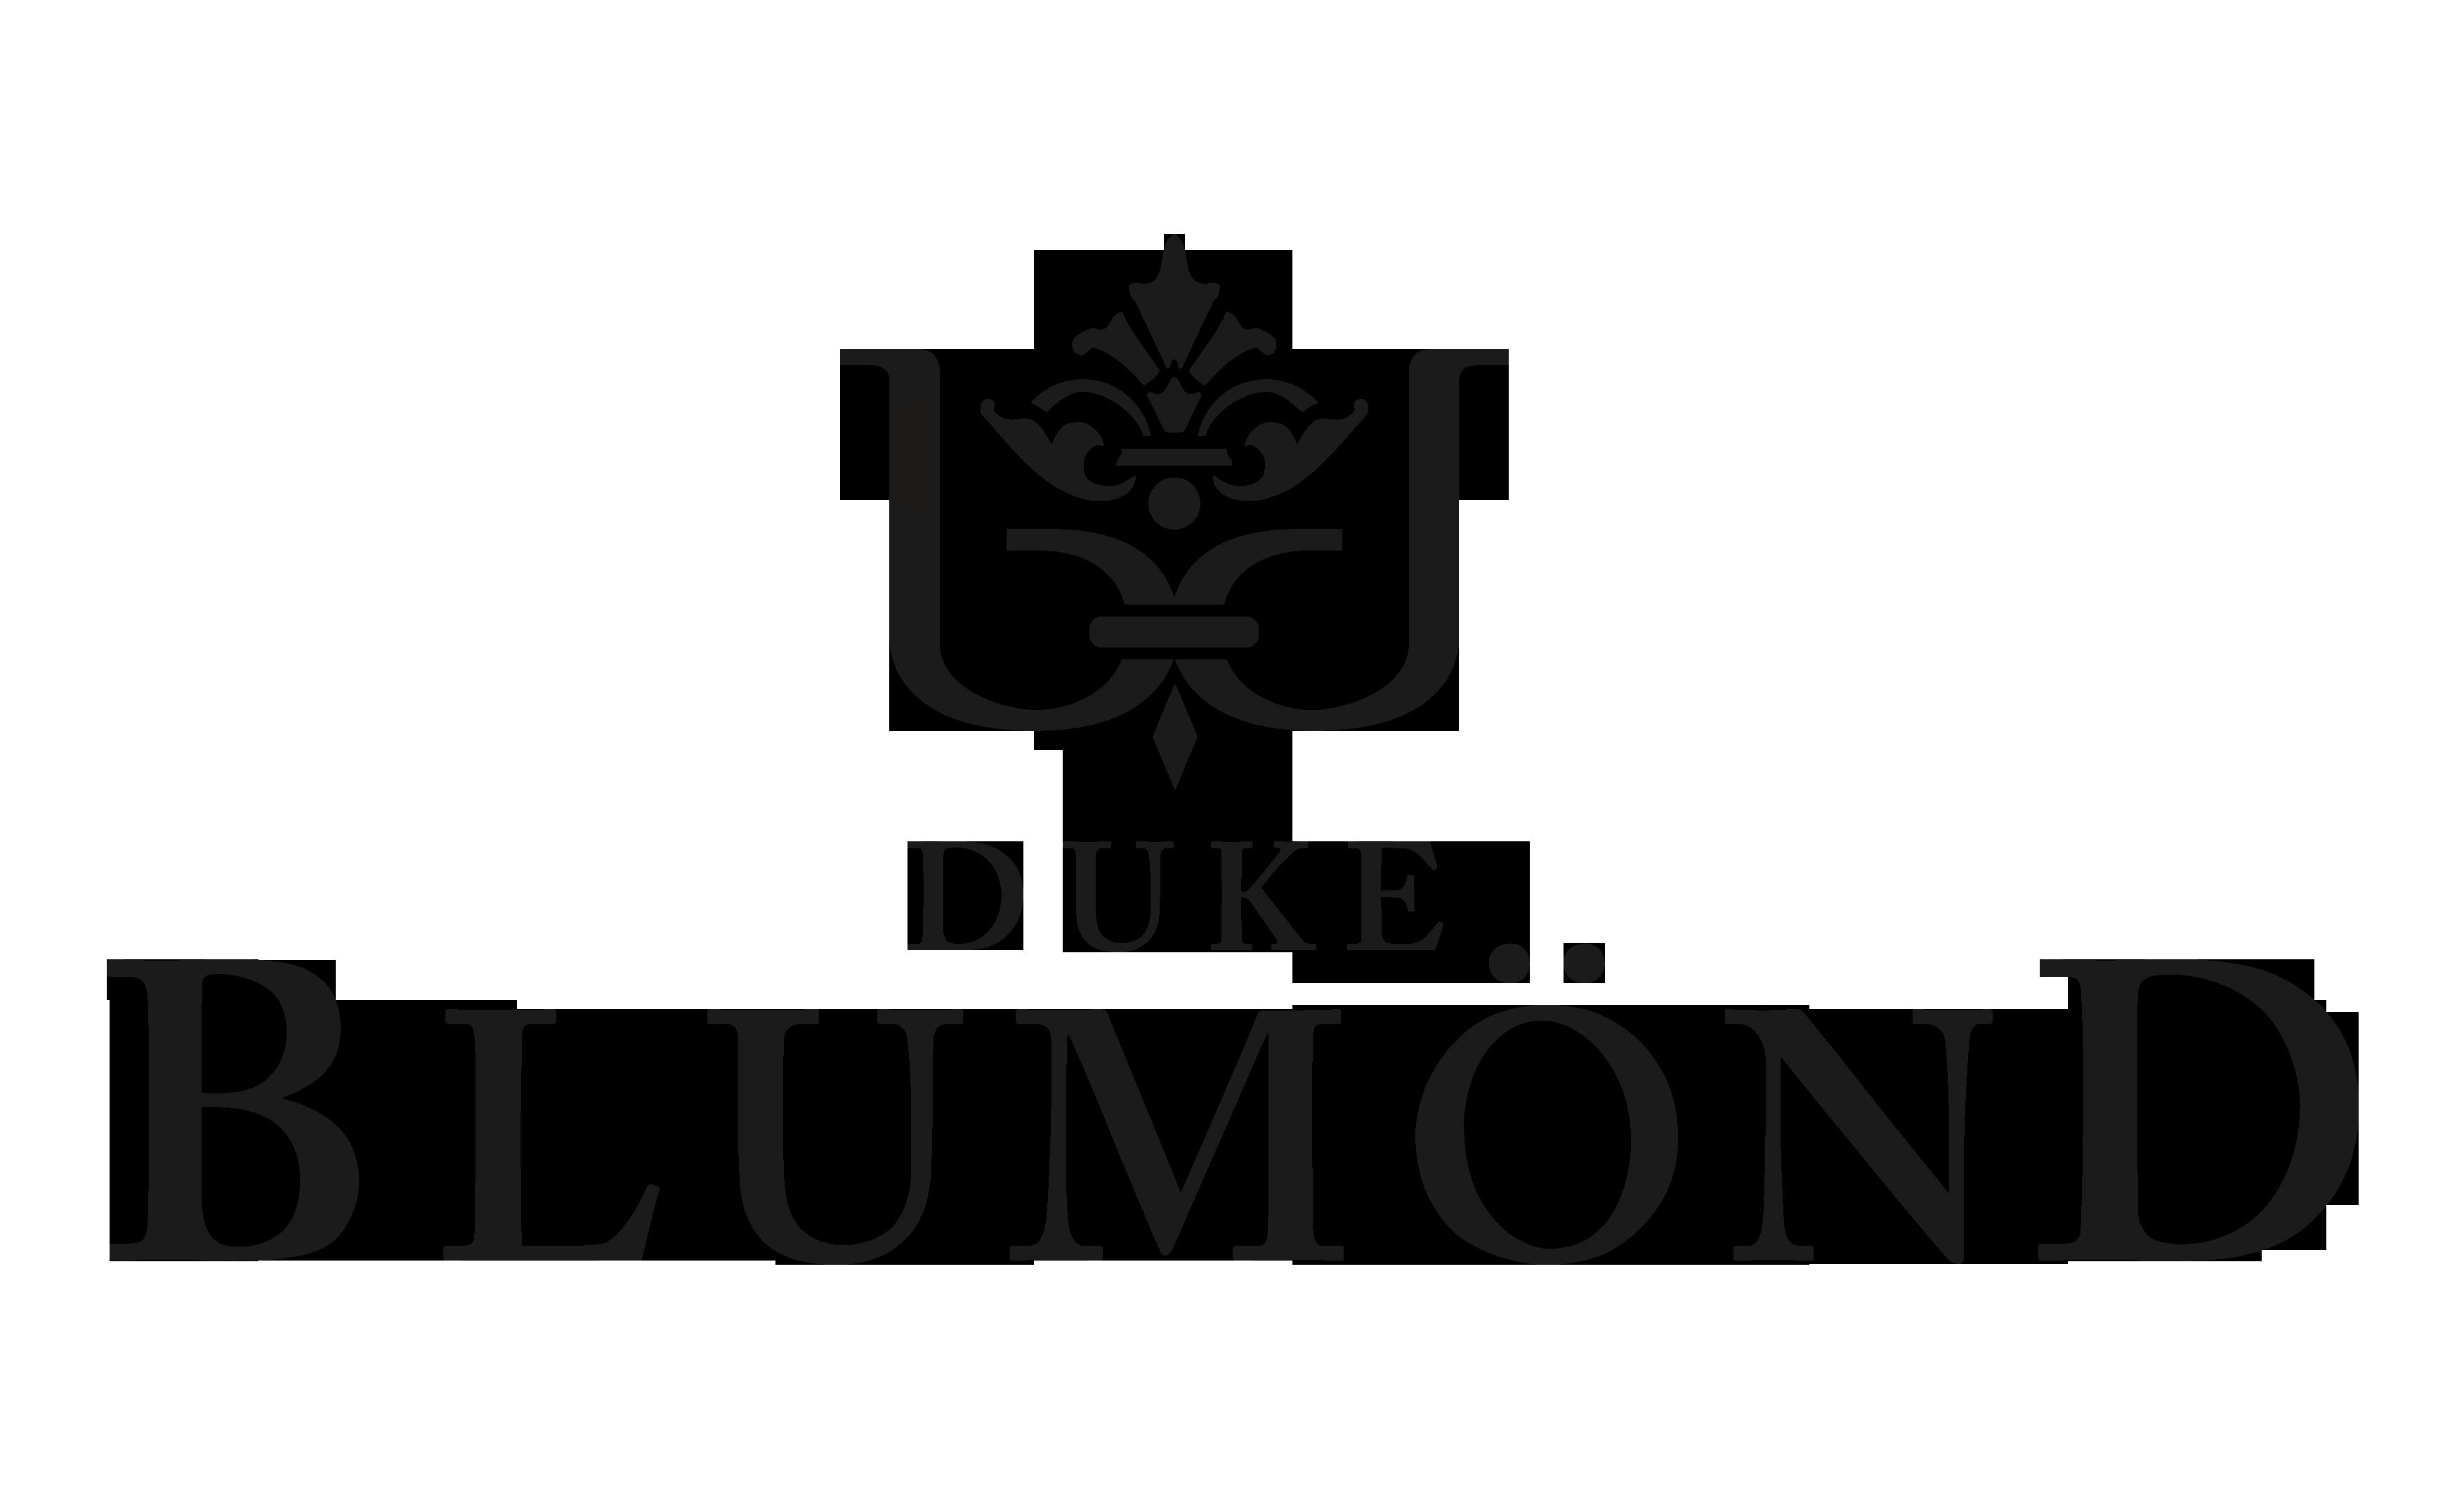 Duke Blumond